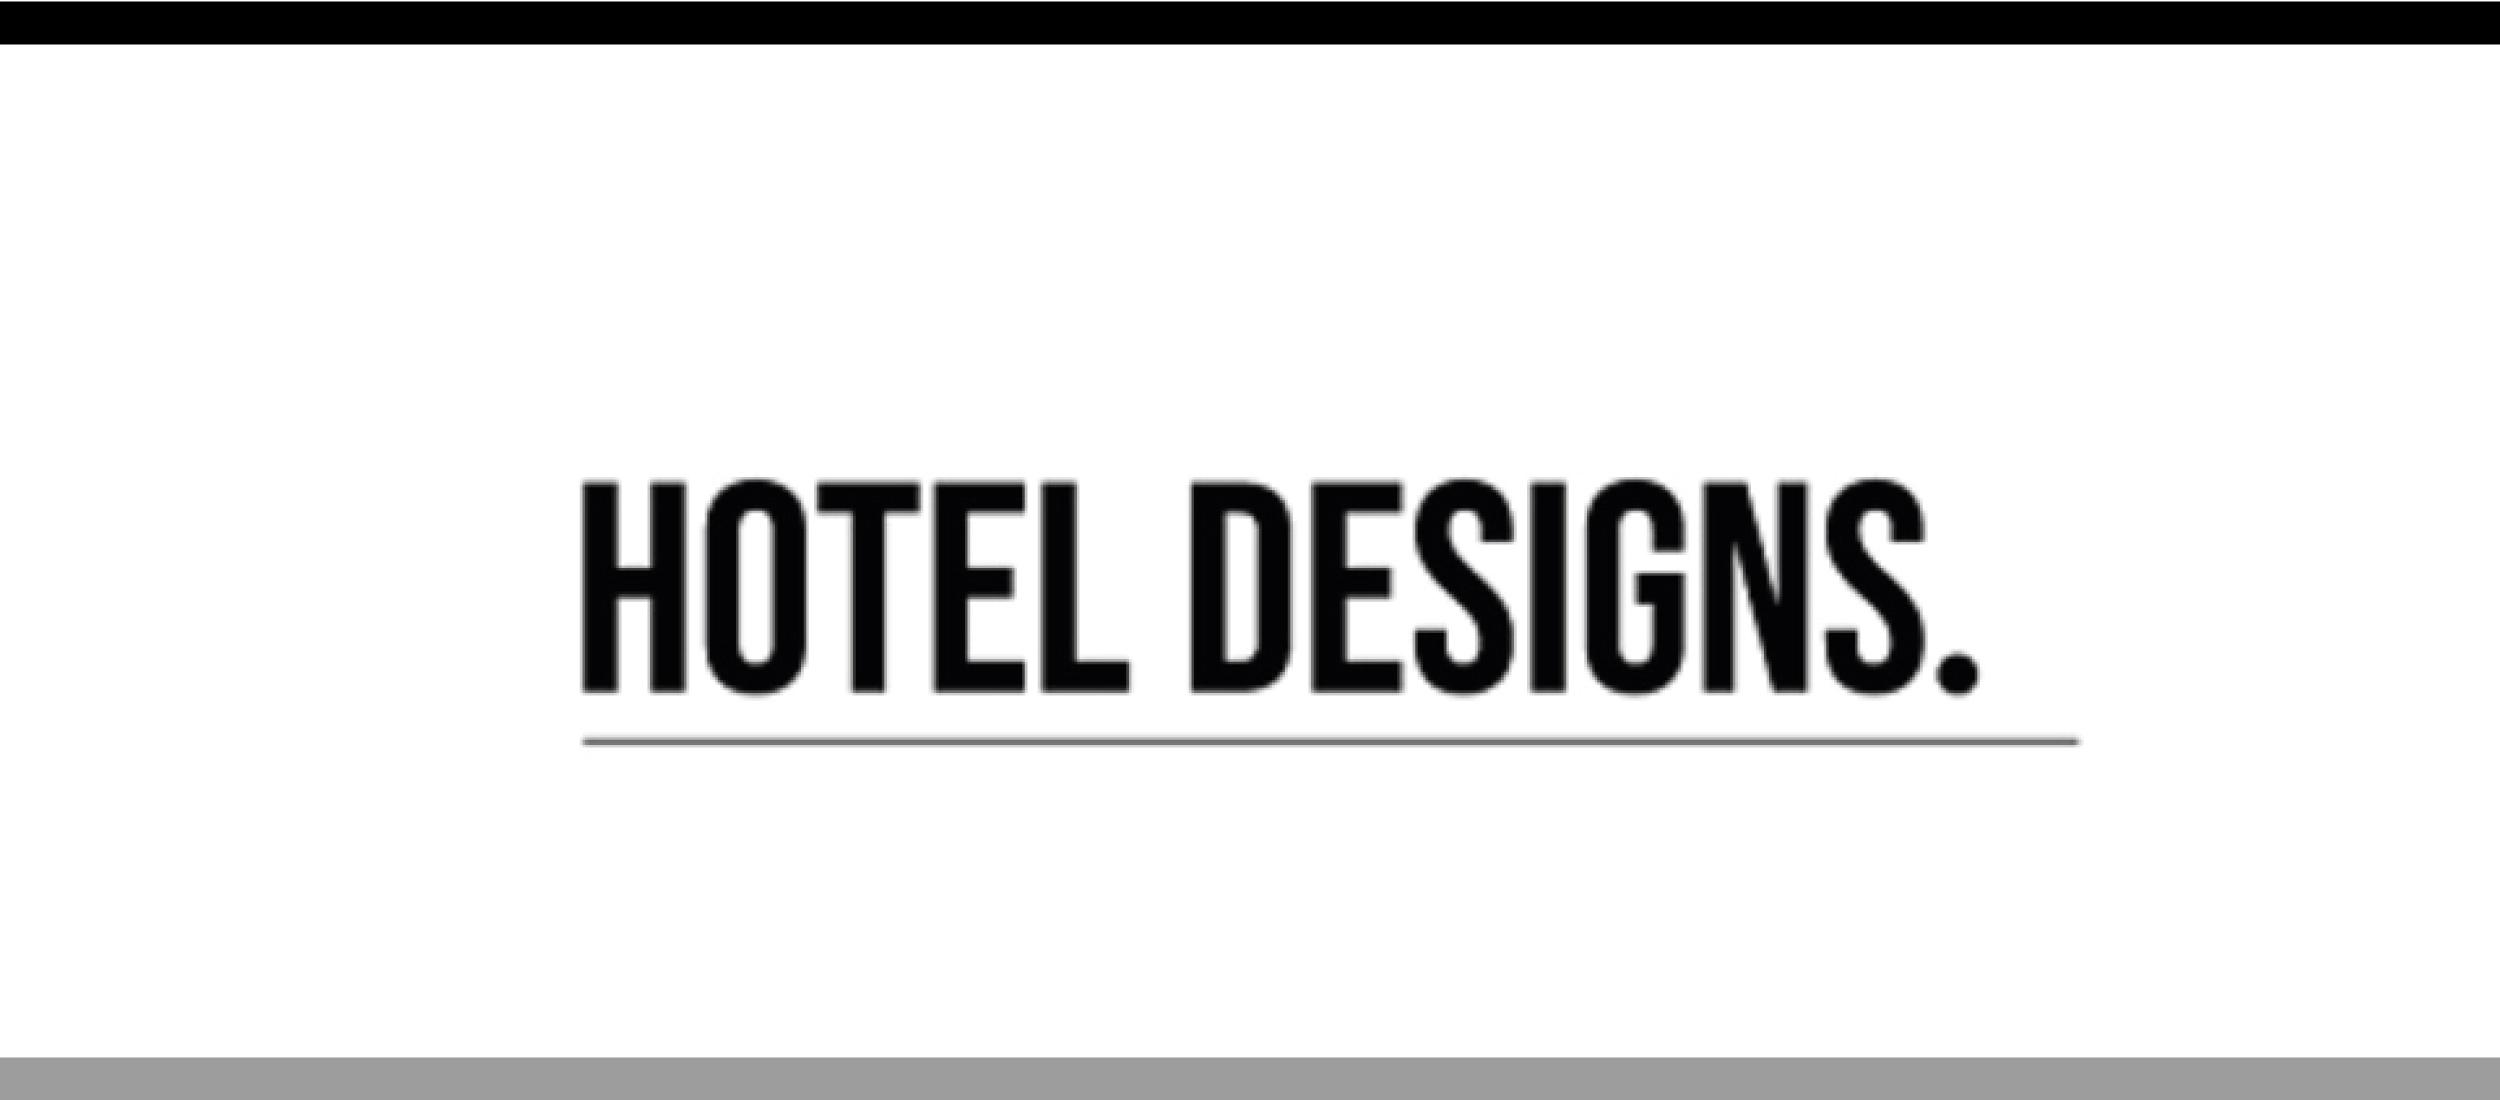 hotel designs logo